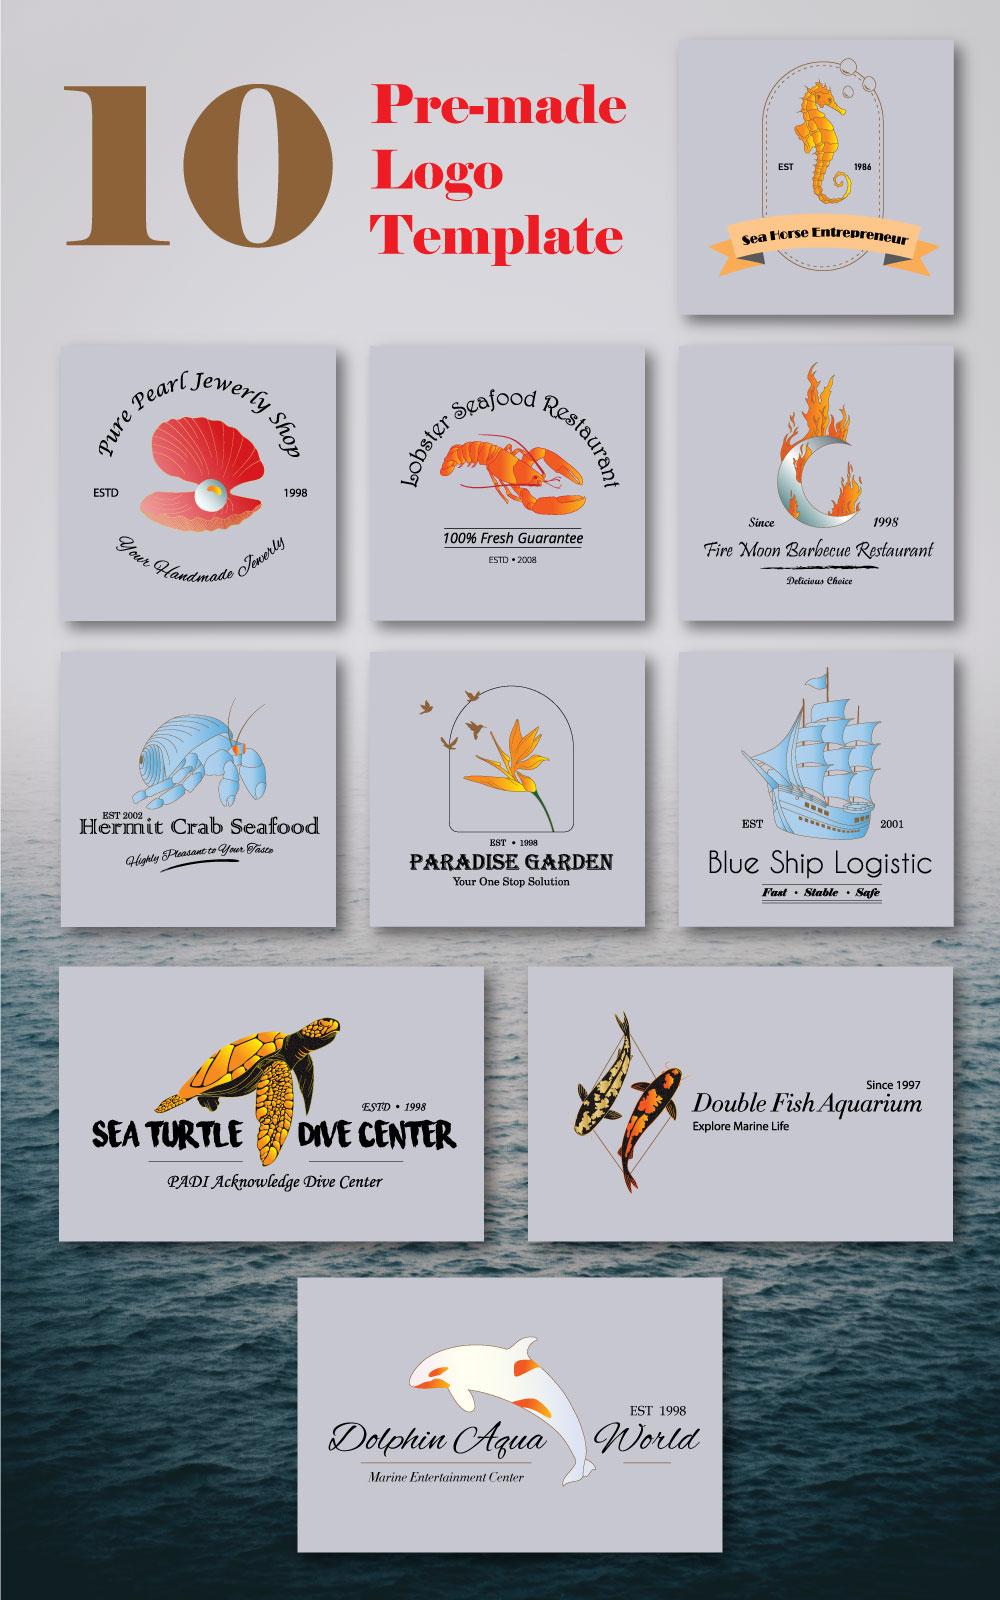 Ocean Mysteries Celestial Elements